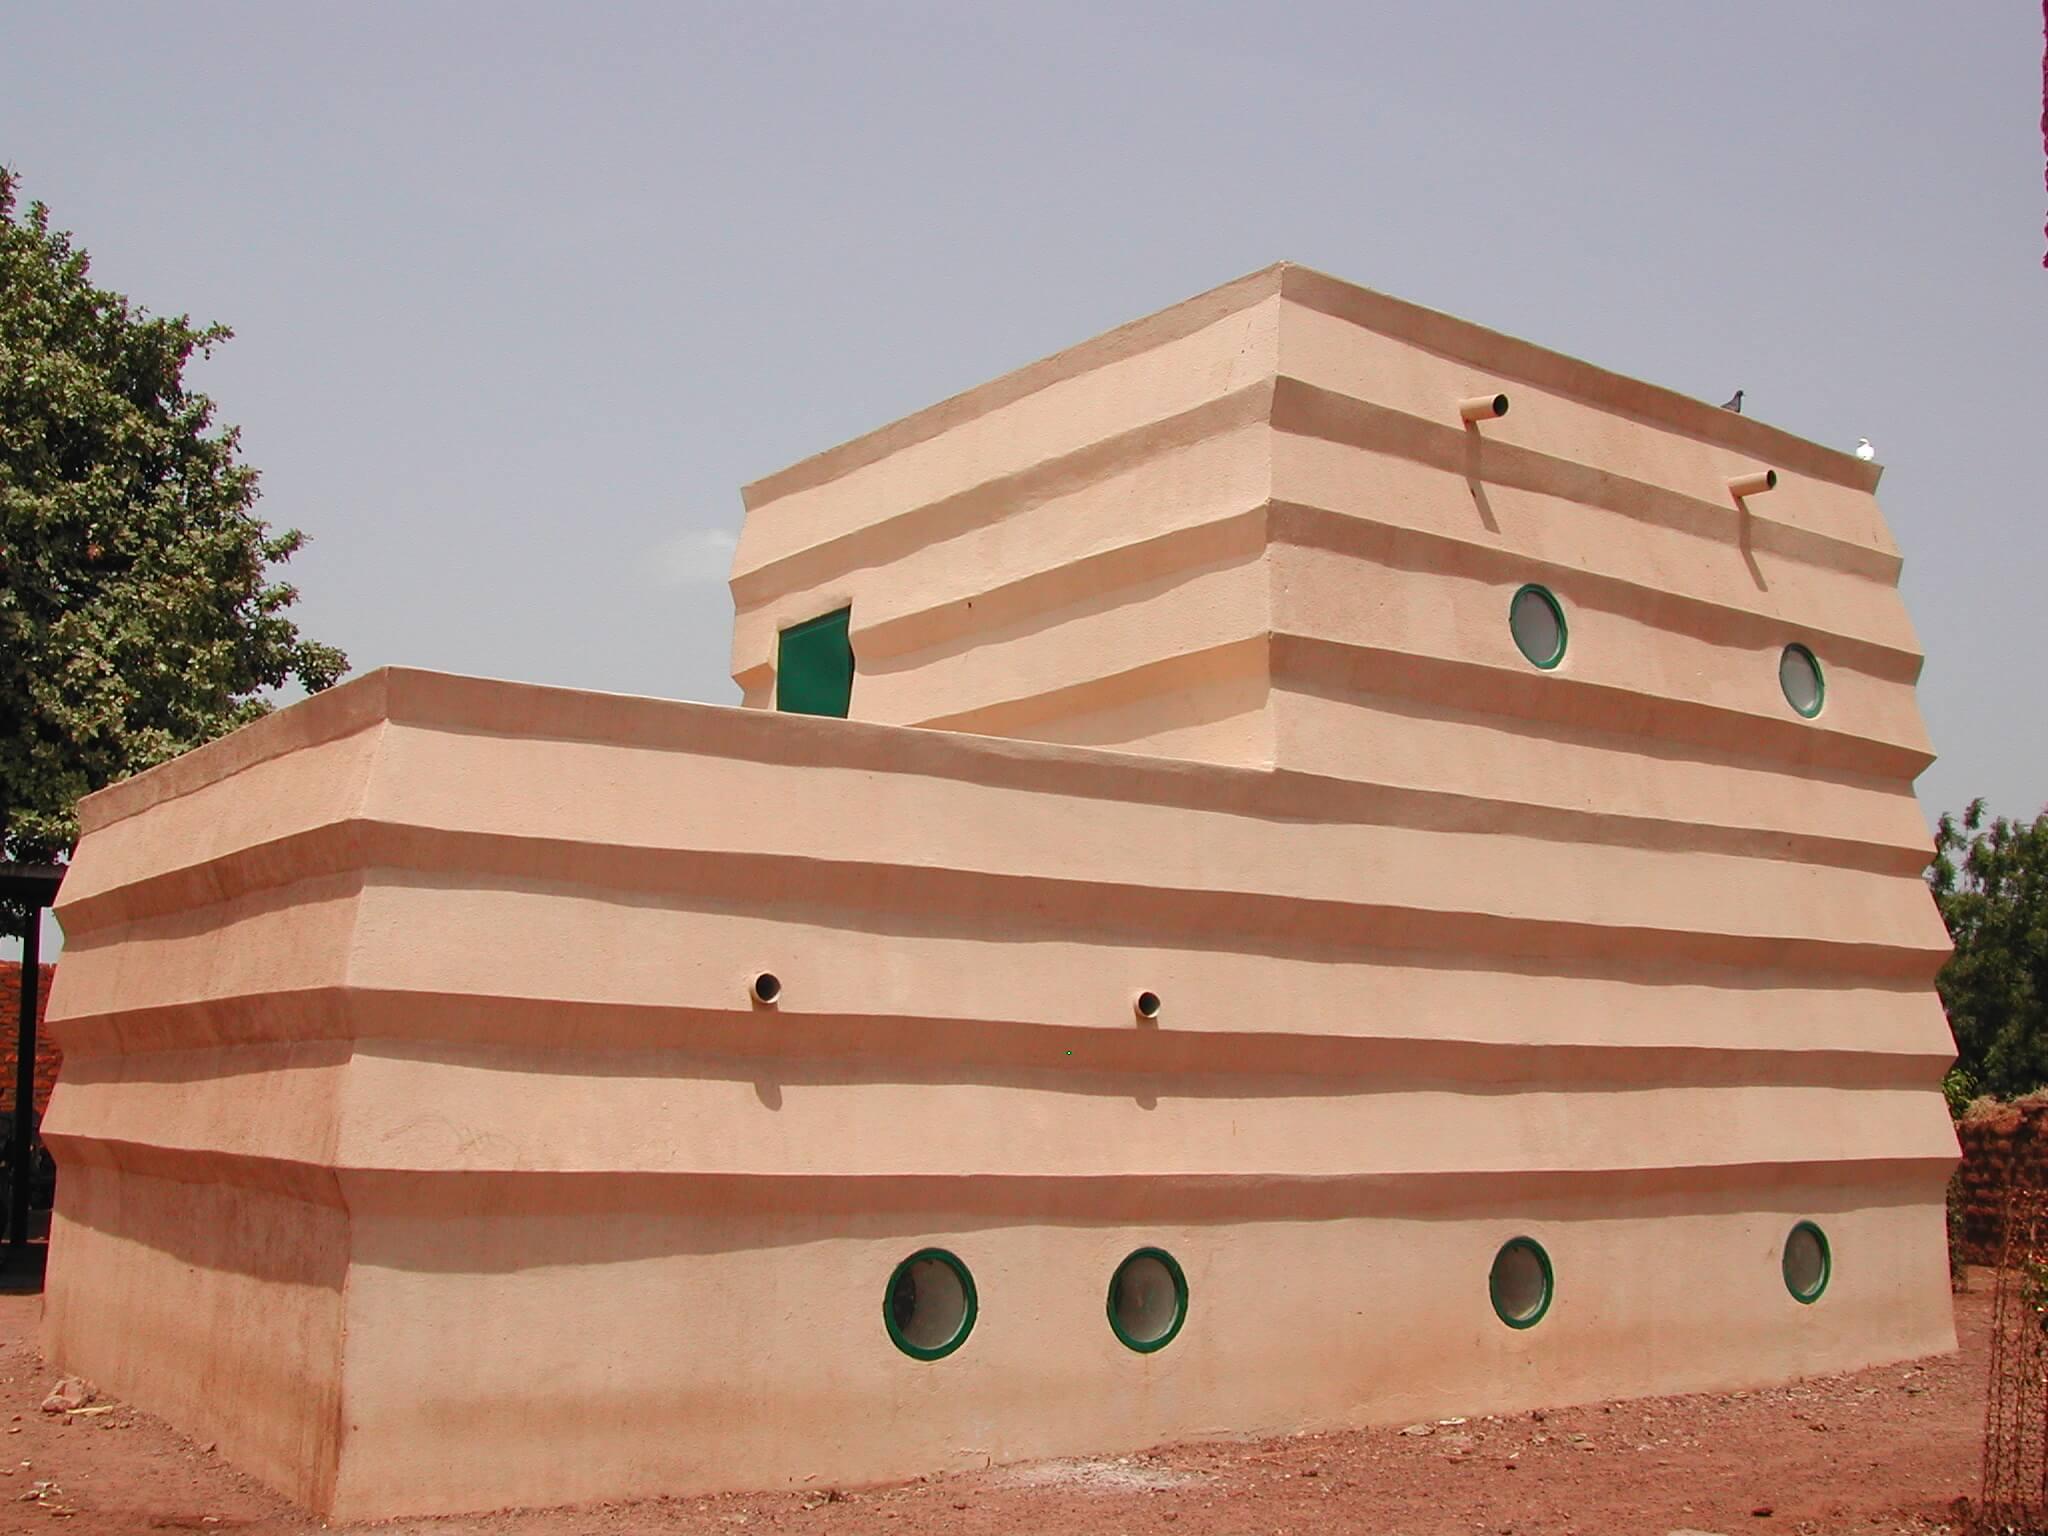 Tiéfo Amoro Mausoleum